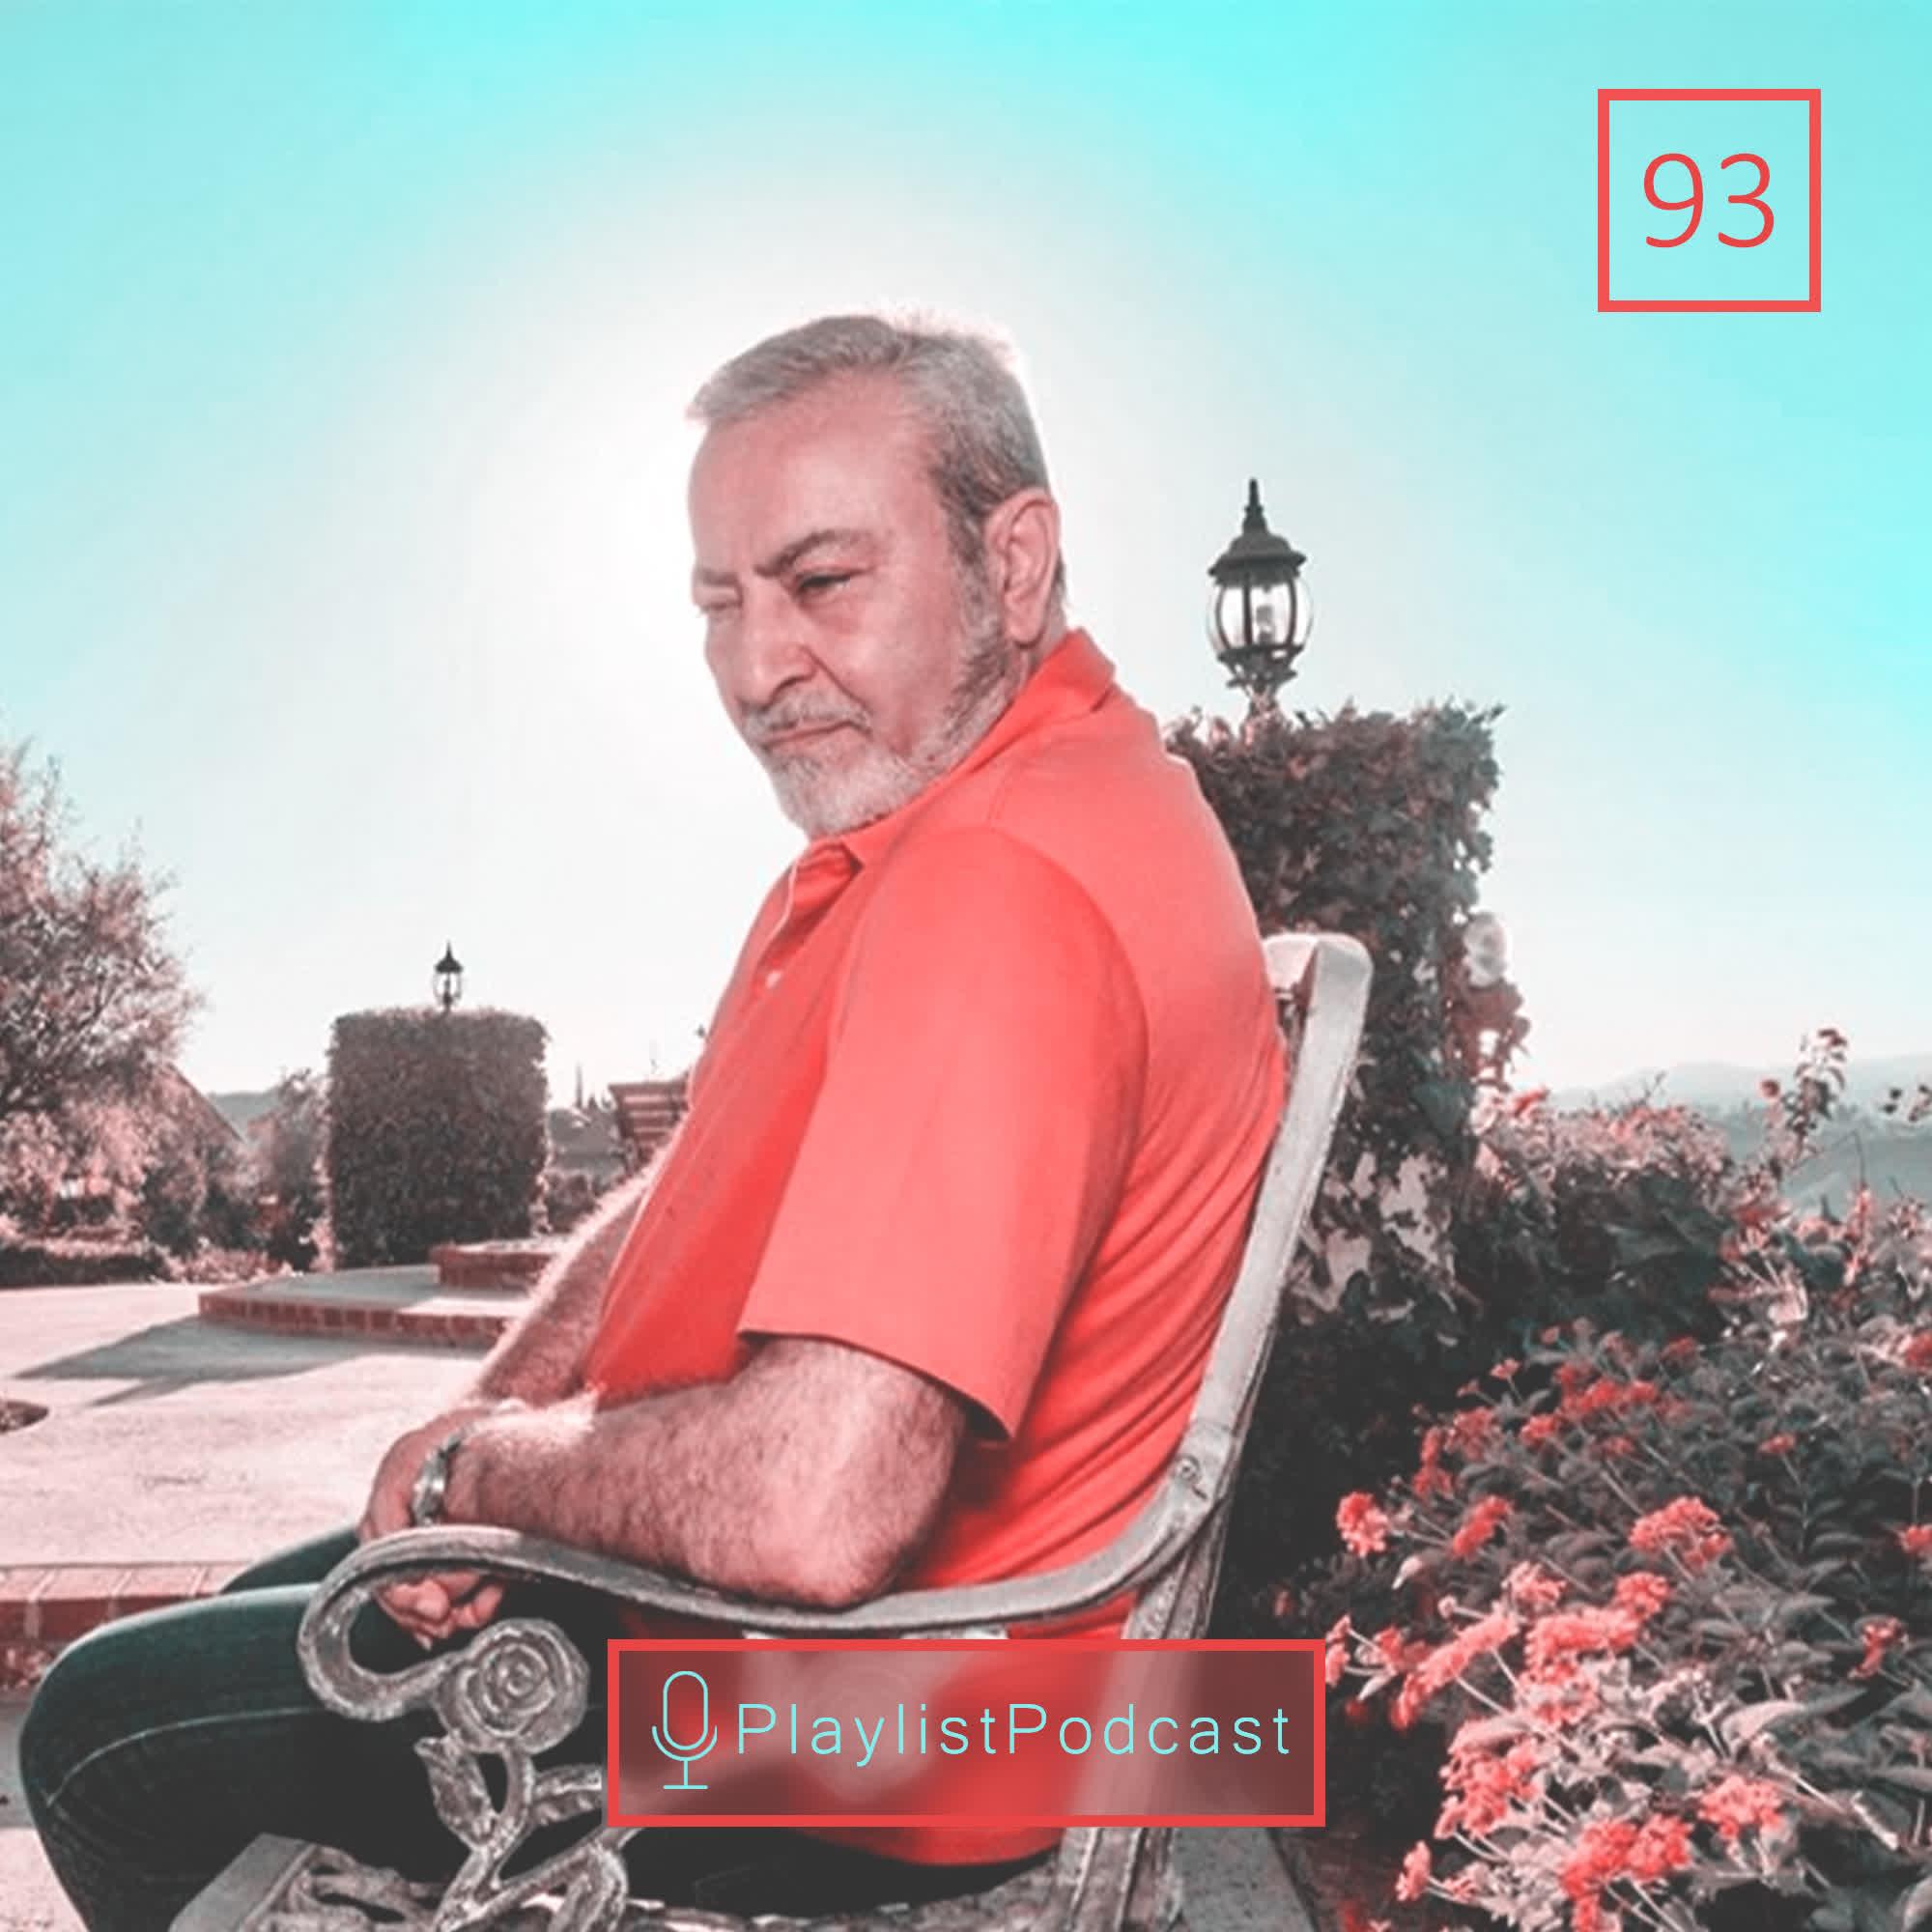 LIVE 93 - پلی لیست لایو - ستار